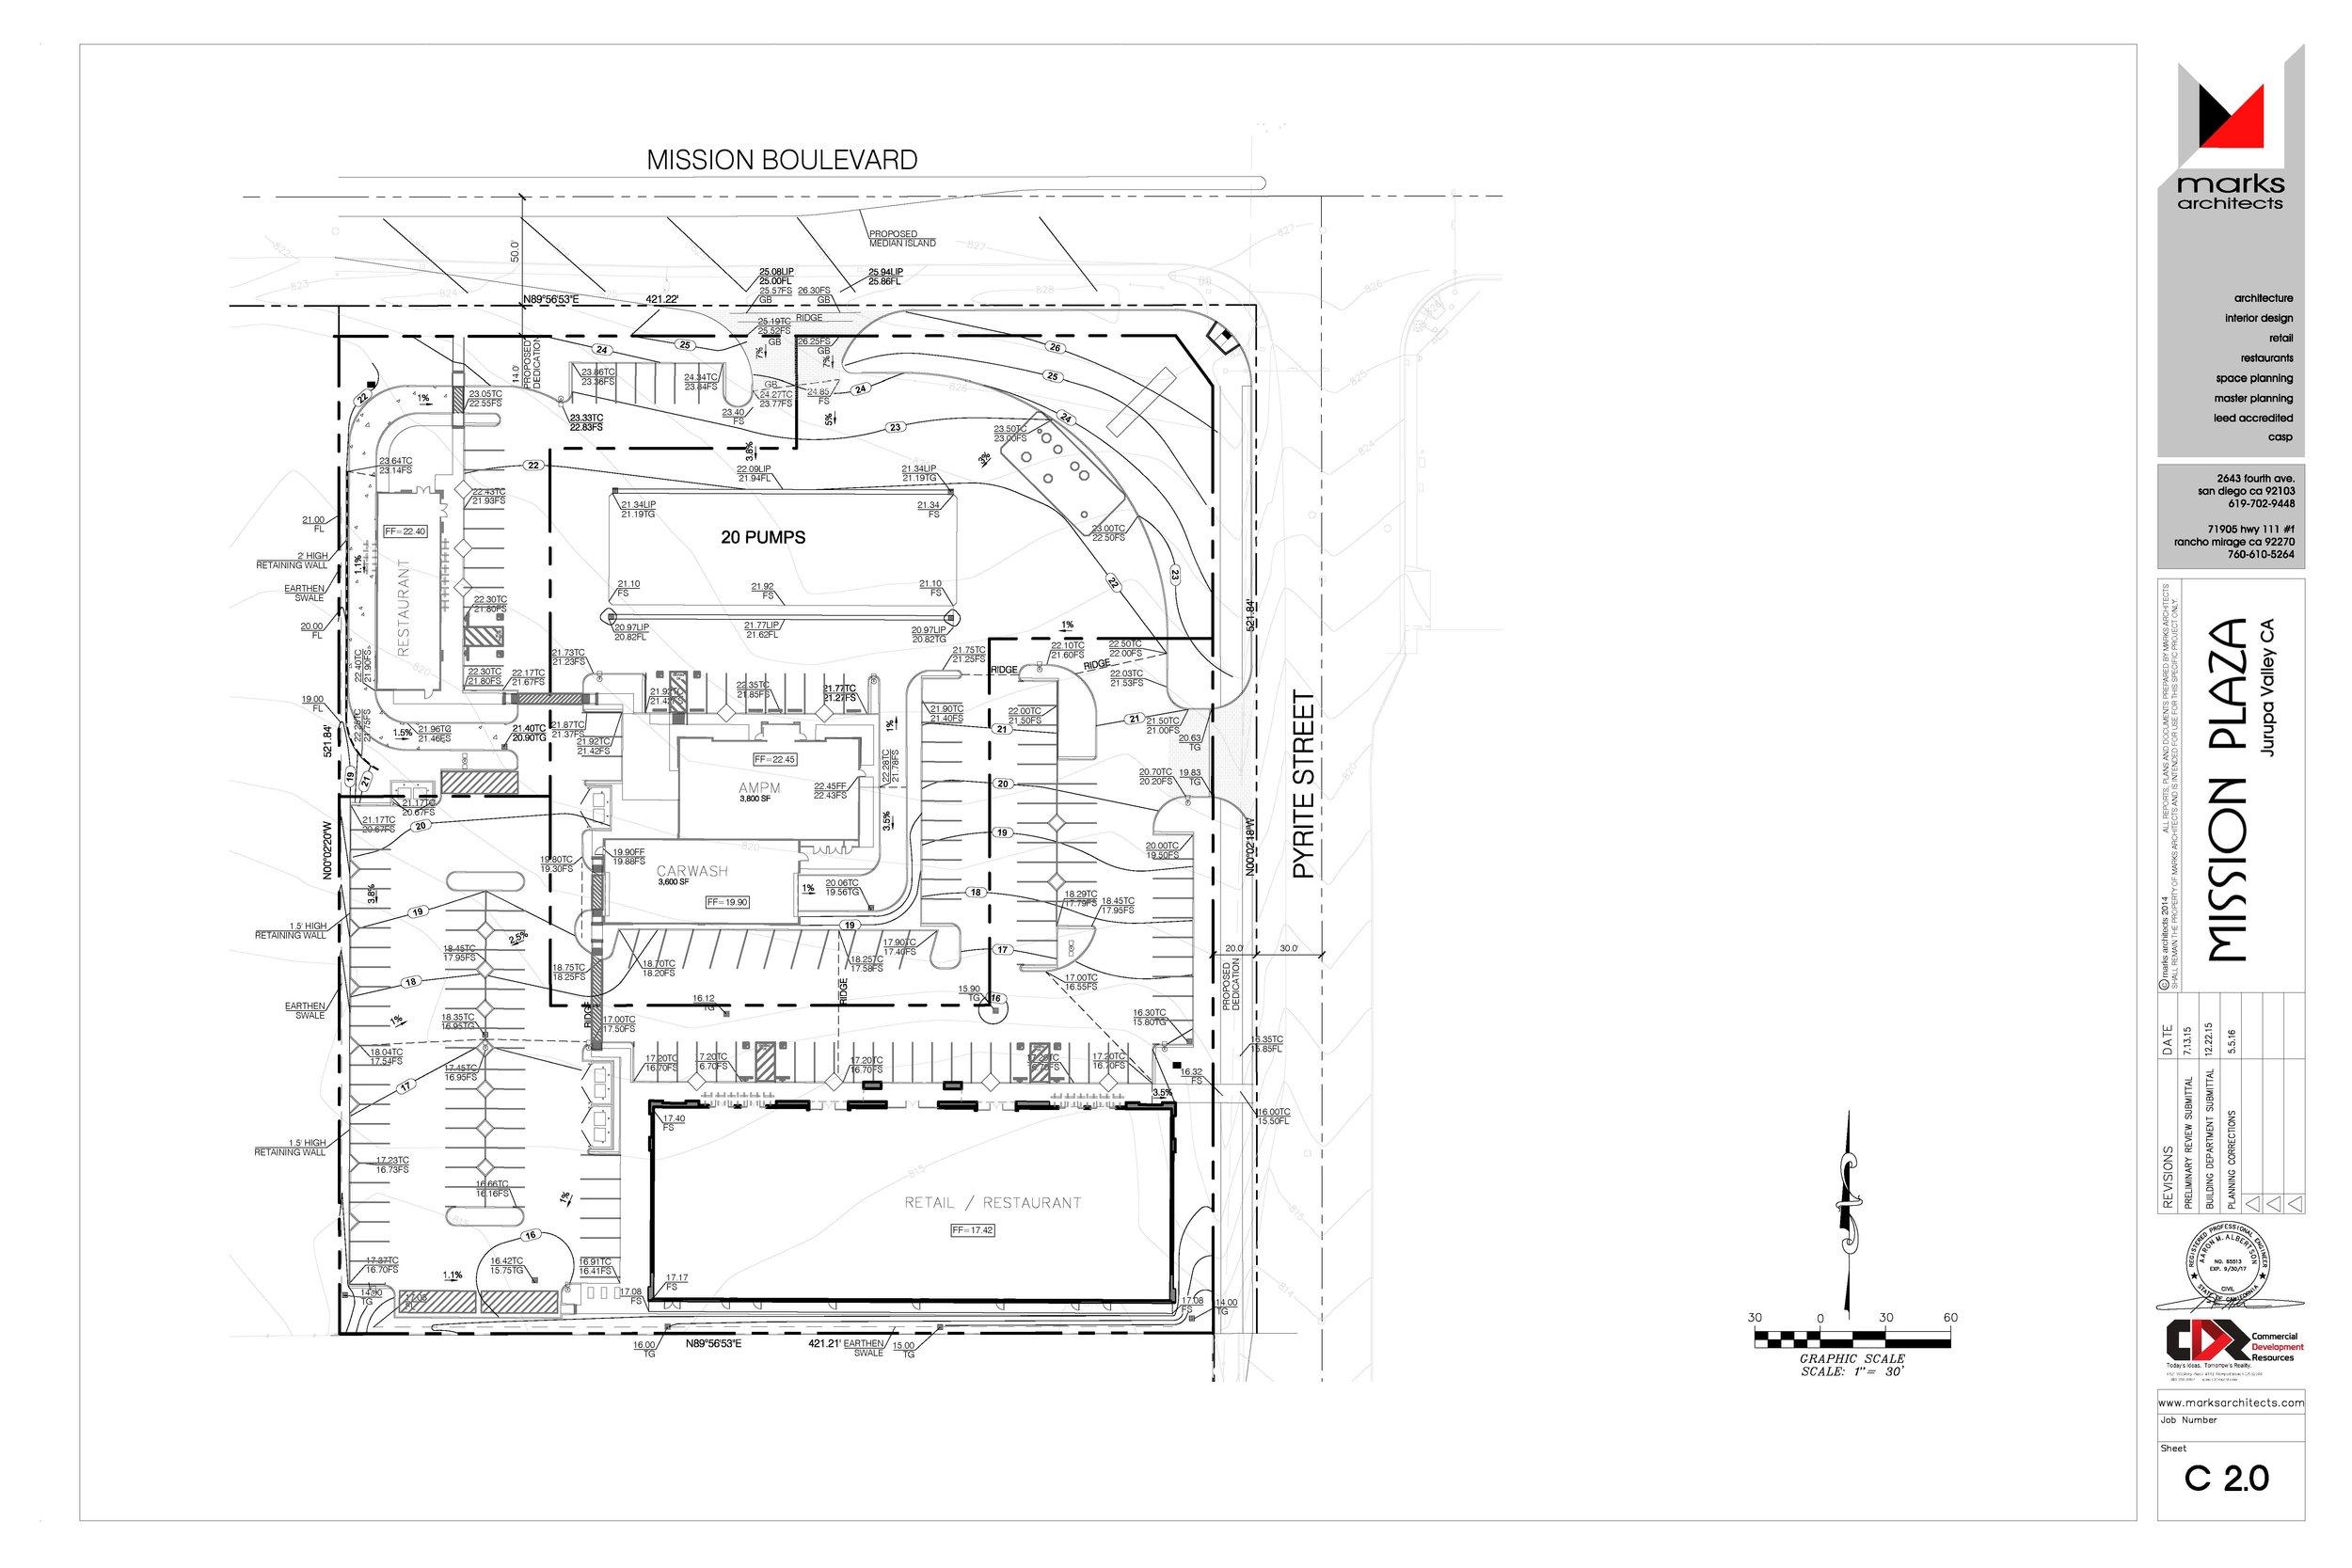 1530-CG-01 Conceptual Grading-Layout1.jpg